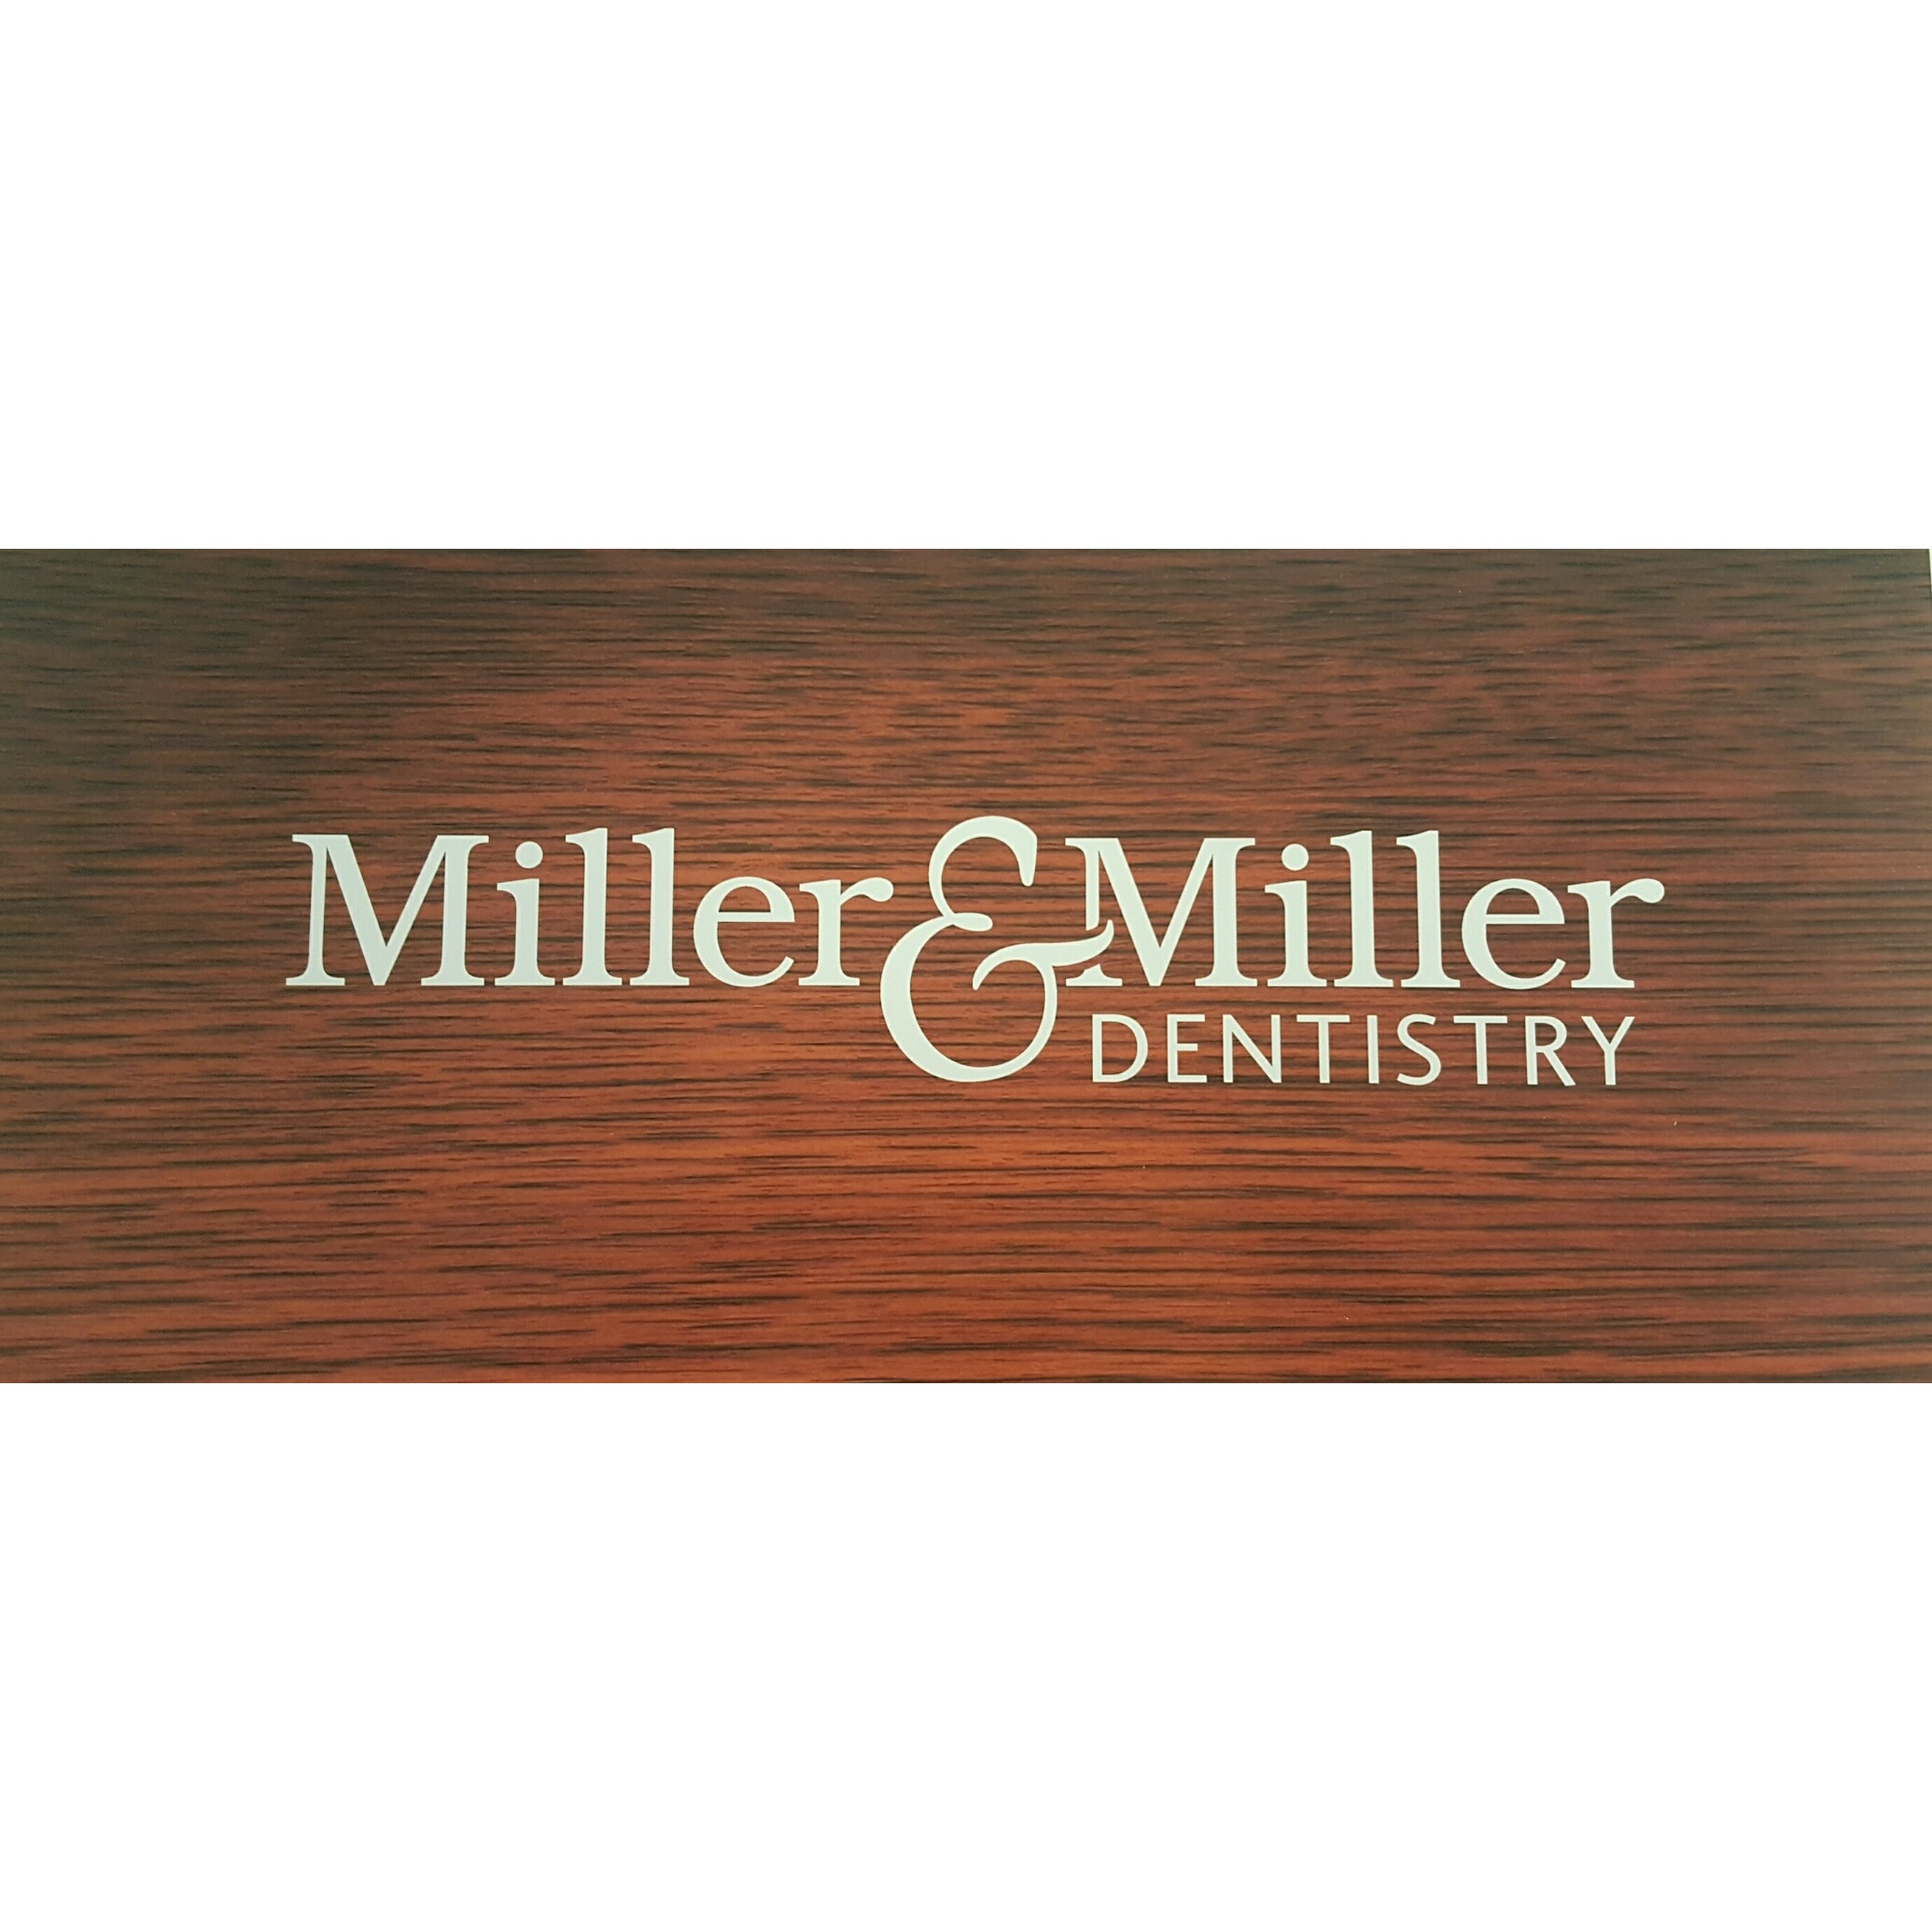 Miller & Miller Dentistry